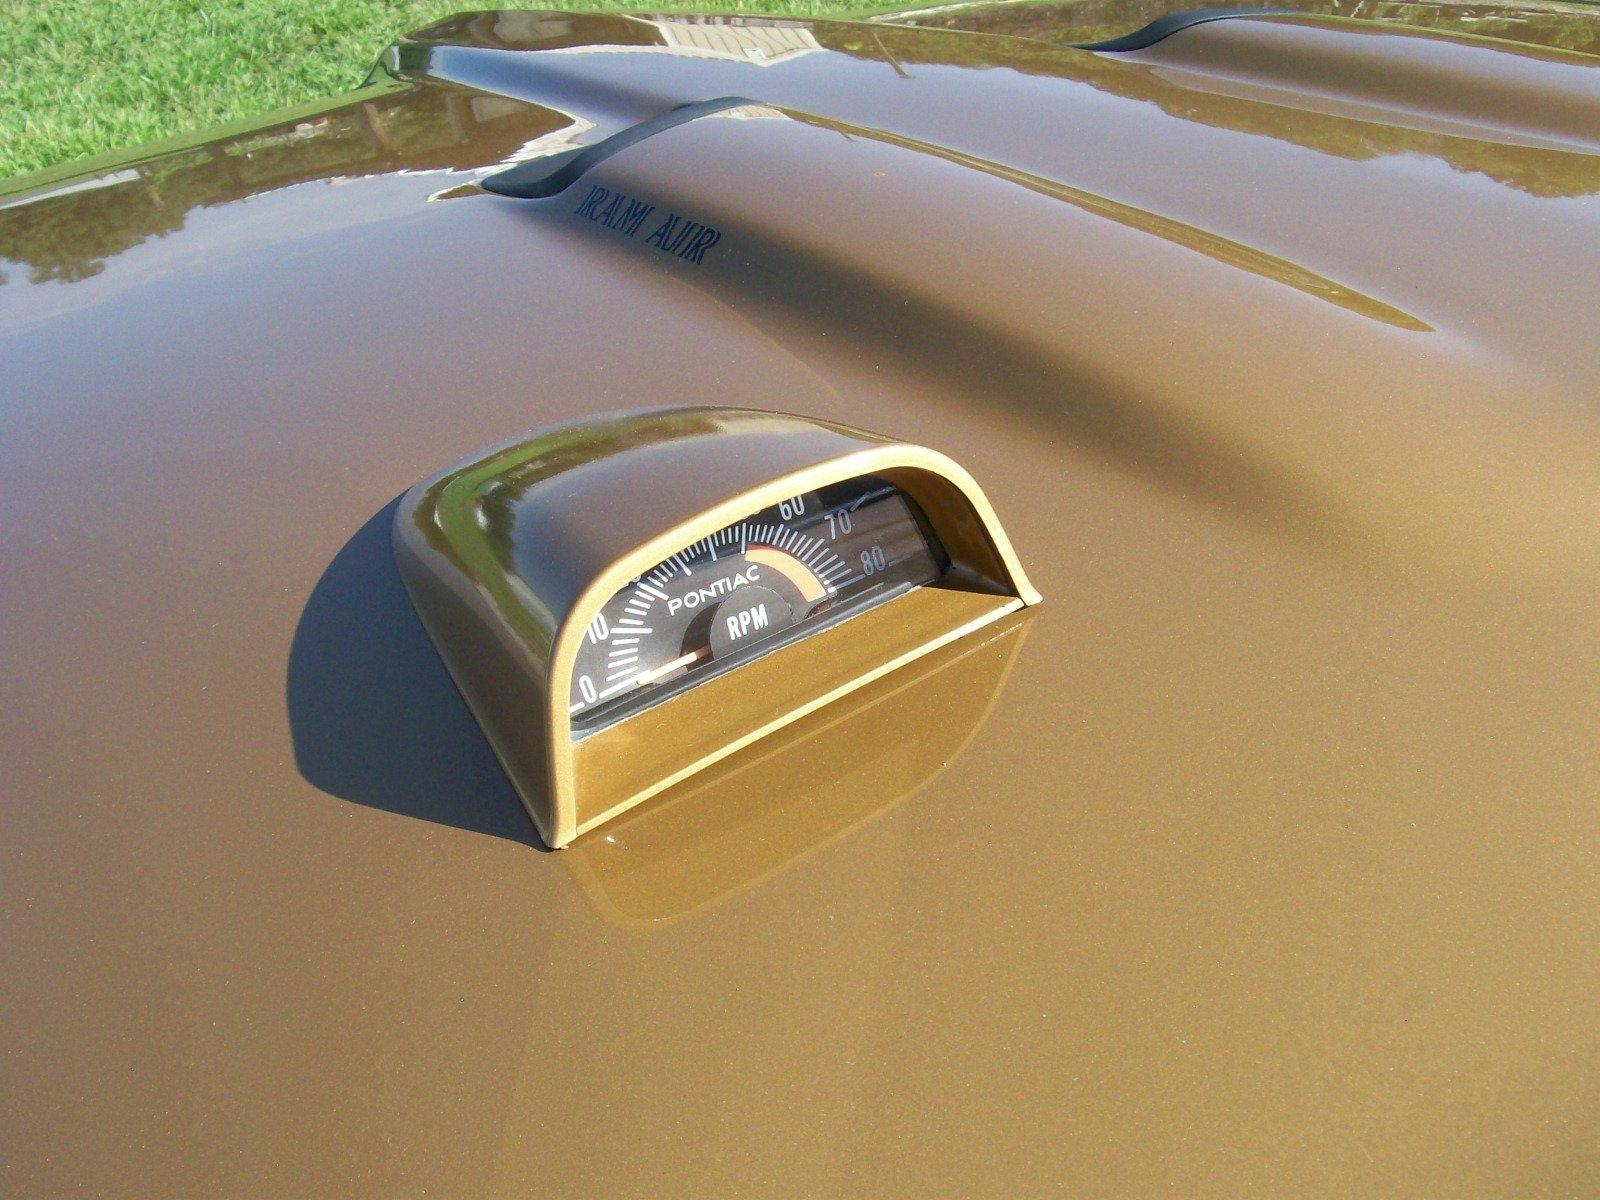 1970 Pontiac Gto The Judge Gaa Classic Cars Hood Tach Wiring Diagram 400 Cid 366hp Ram Air Iii 4 Speed Manual Transmission